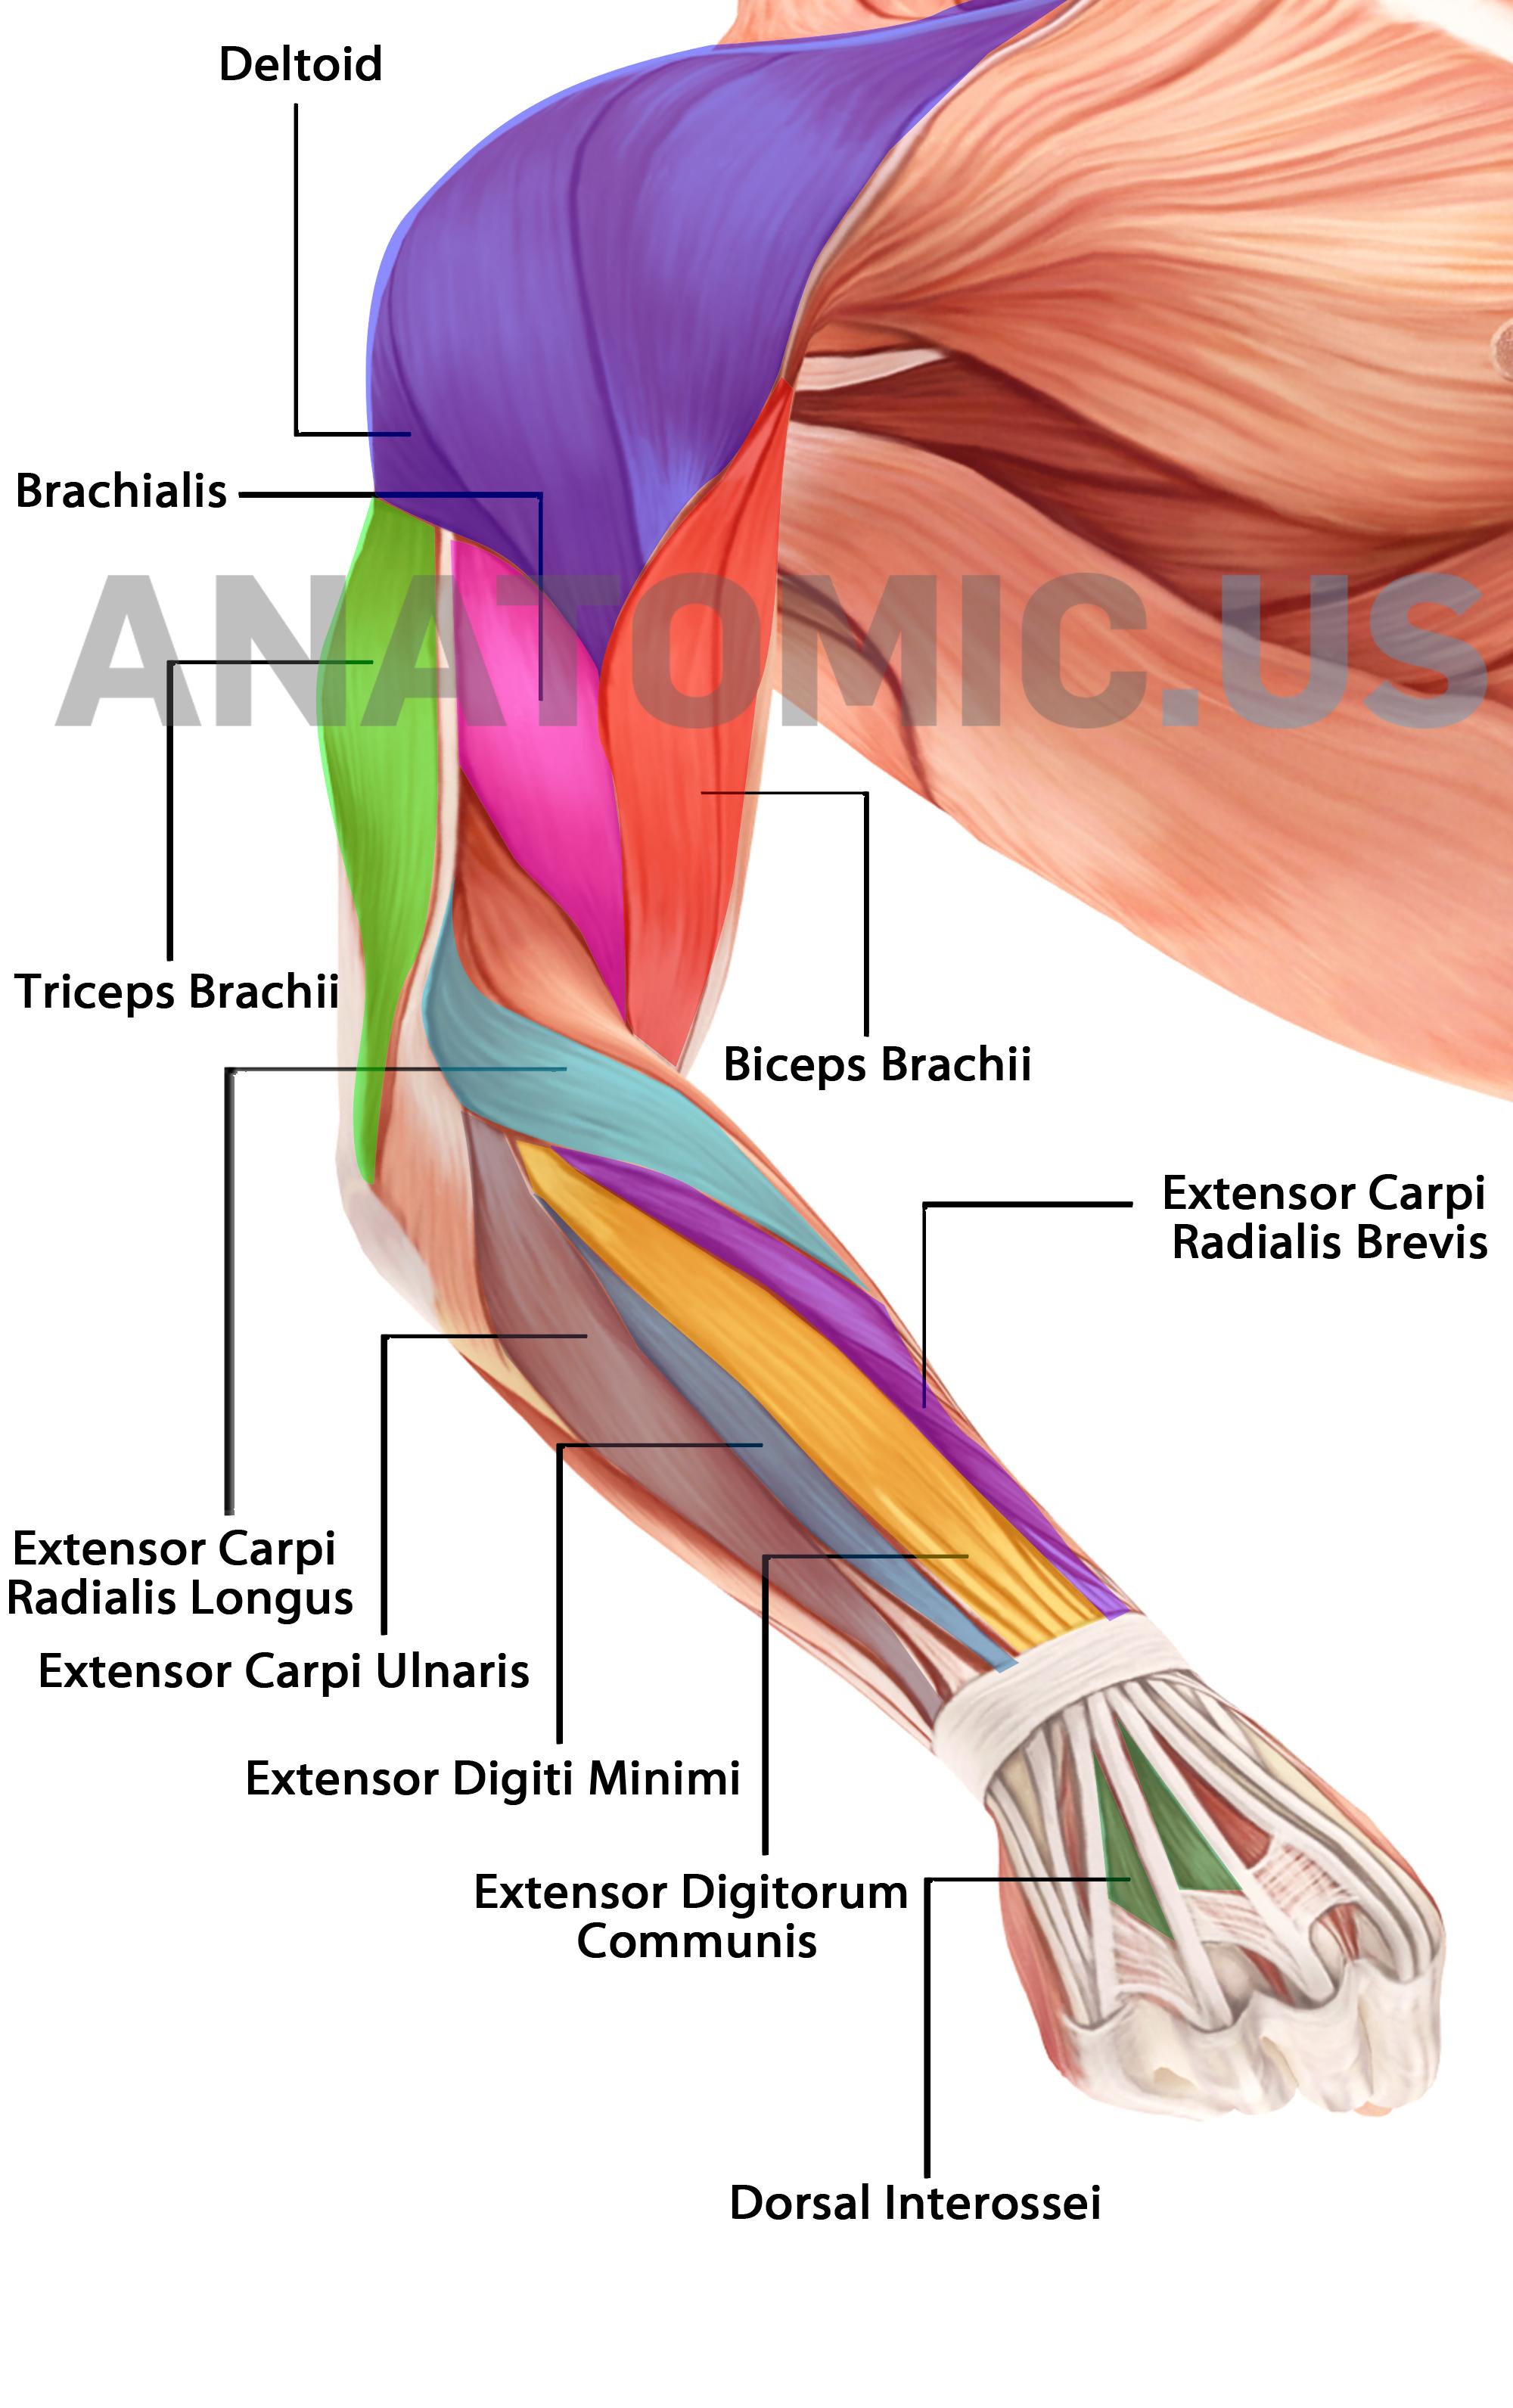 muscular system anatomy flashcards anatomic us muscles of face anatomy cards anatomic us www anatomic us  [ 2000 x 3183 Pixel ]